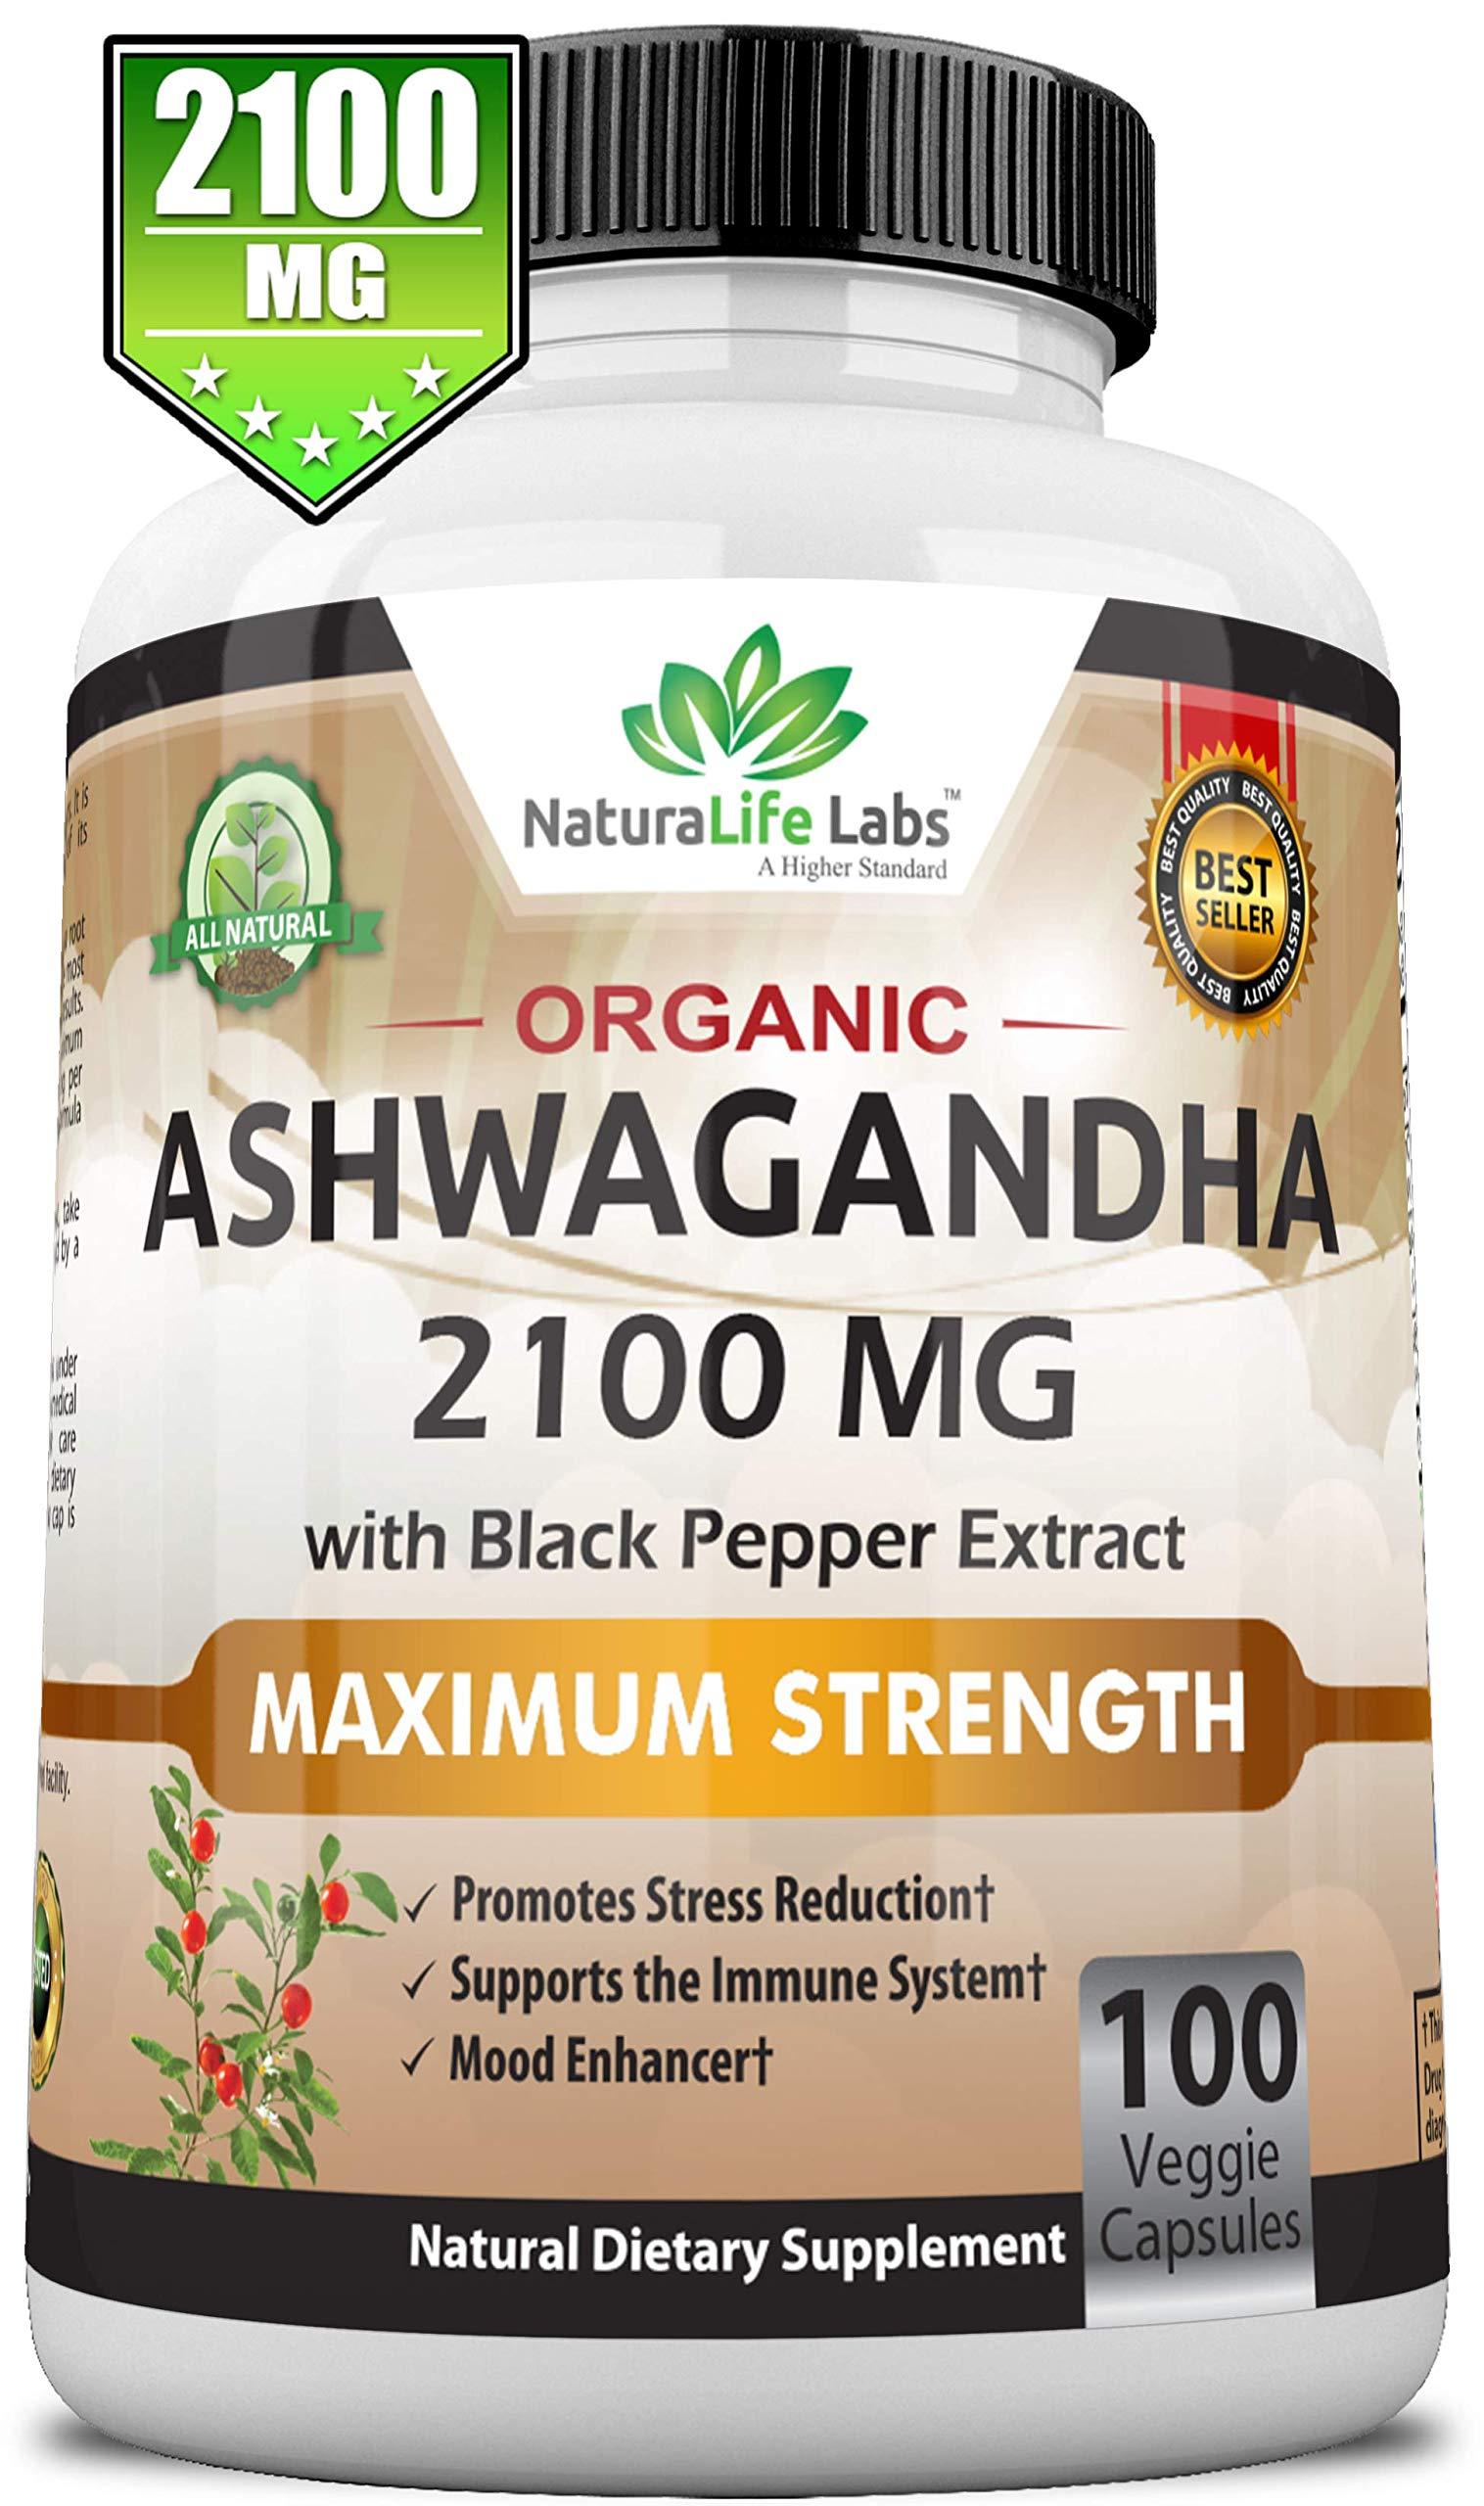 Organic Ashwagandha 2,100 mg - 100 Vegan Capsules Pure Organic Ashwagandha Root Extract and Powder - Natural Anxiety Relief, Mood Enhancer, Immune & Thyroid Support, Anti Anxiety by NaturaLife Labs